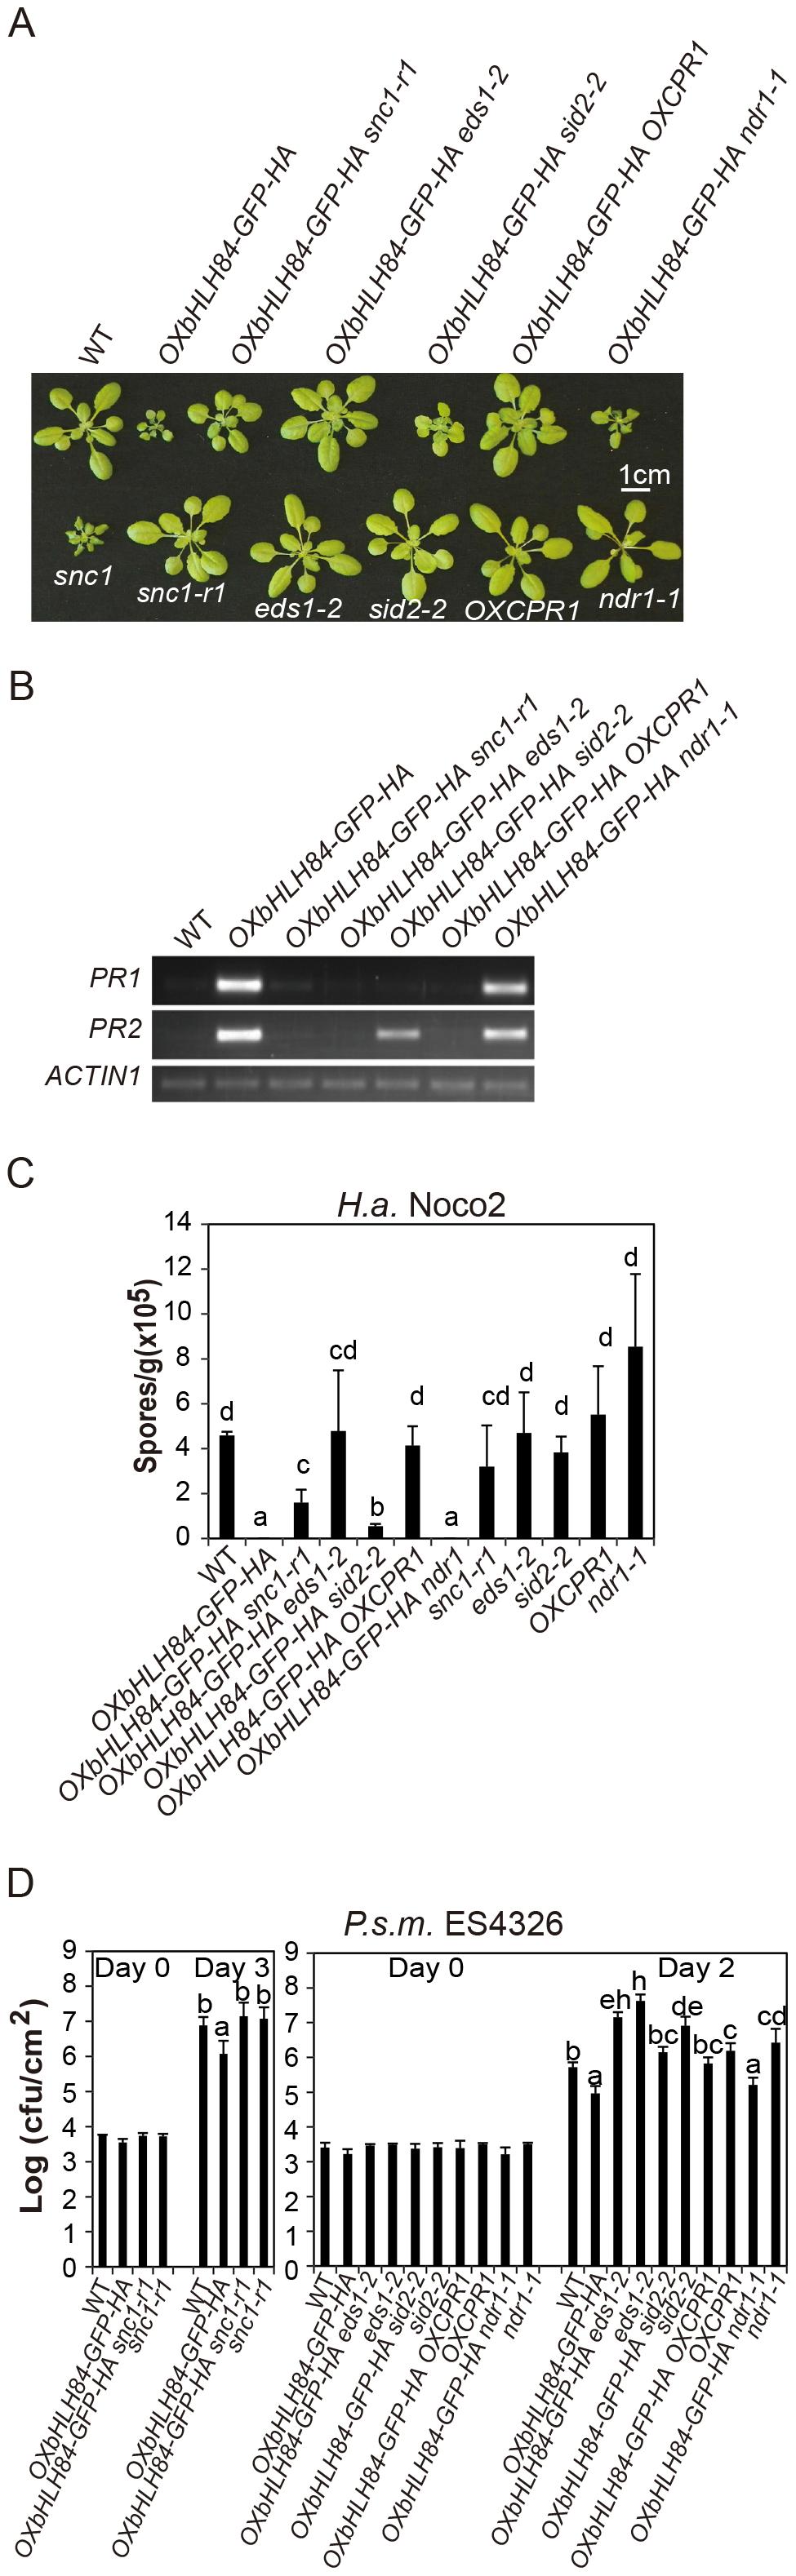 Epistasis analysis between <i>OXbHLH84-GFP-HA</i> and <i>snc1-r1</i>, <i>eds1-2</i>, <i>sid2-2</i>, <i>OXCPR1</i>, and <i>ndr1-1</i>.